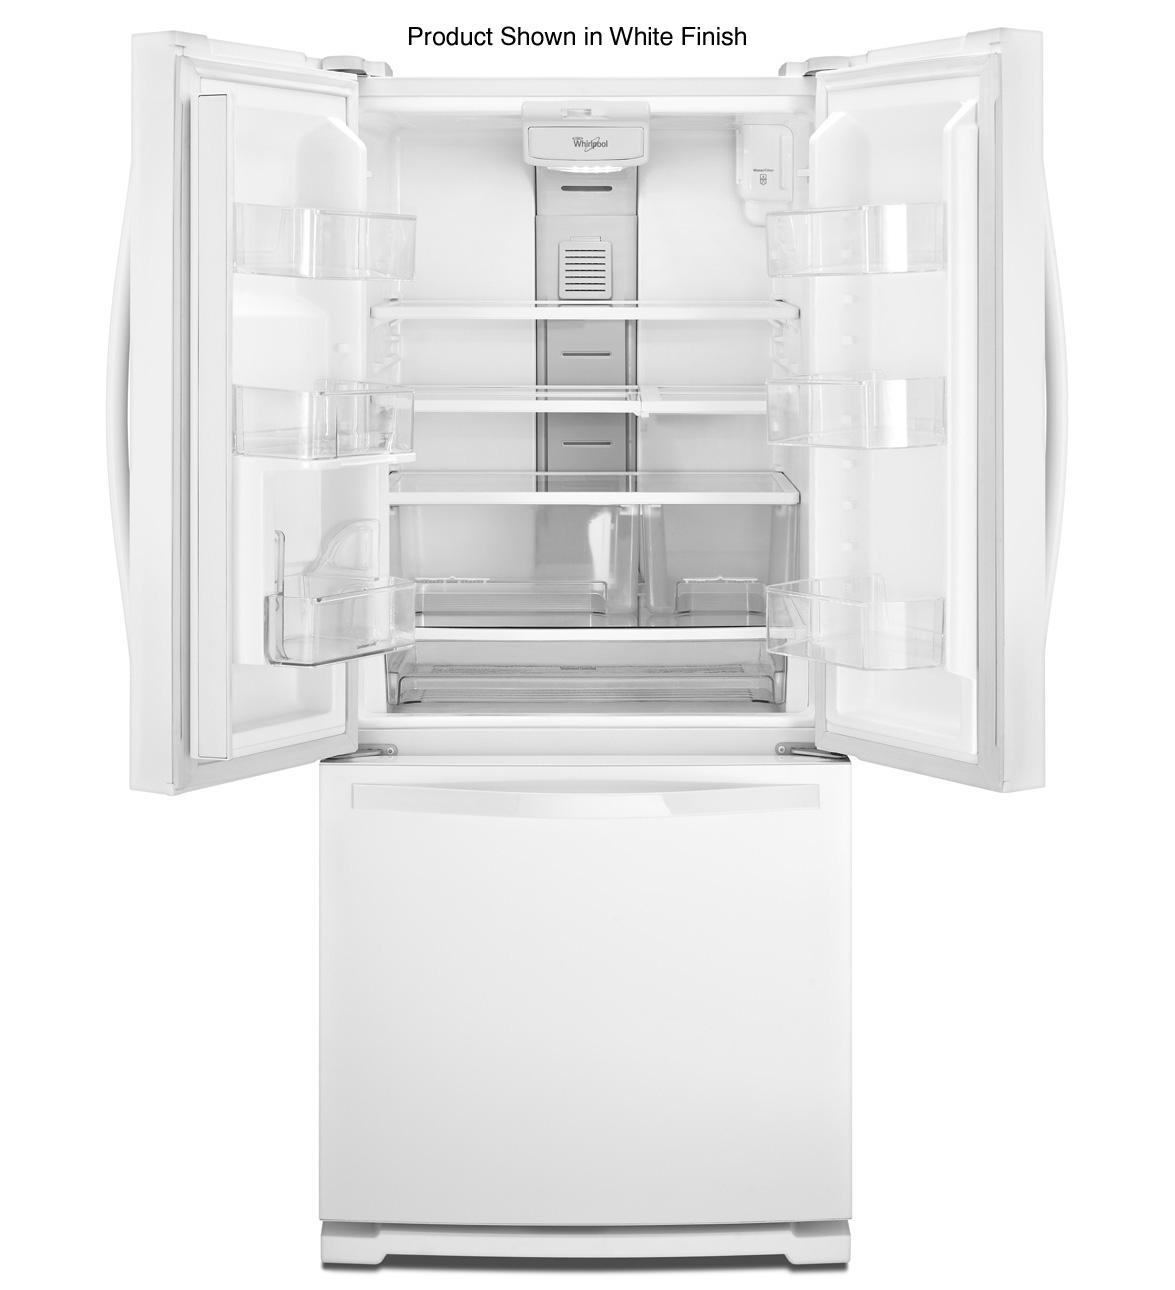 Whirlpool French Door Refrigerator - WRF560SEYM - Abt